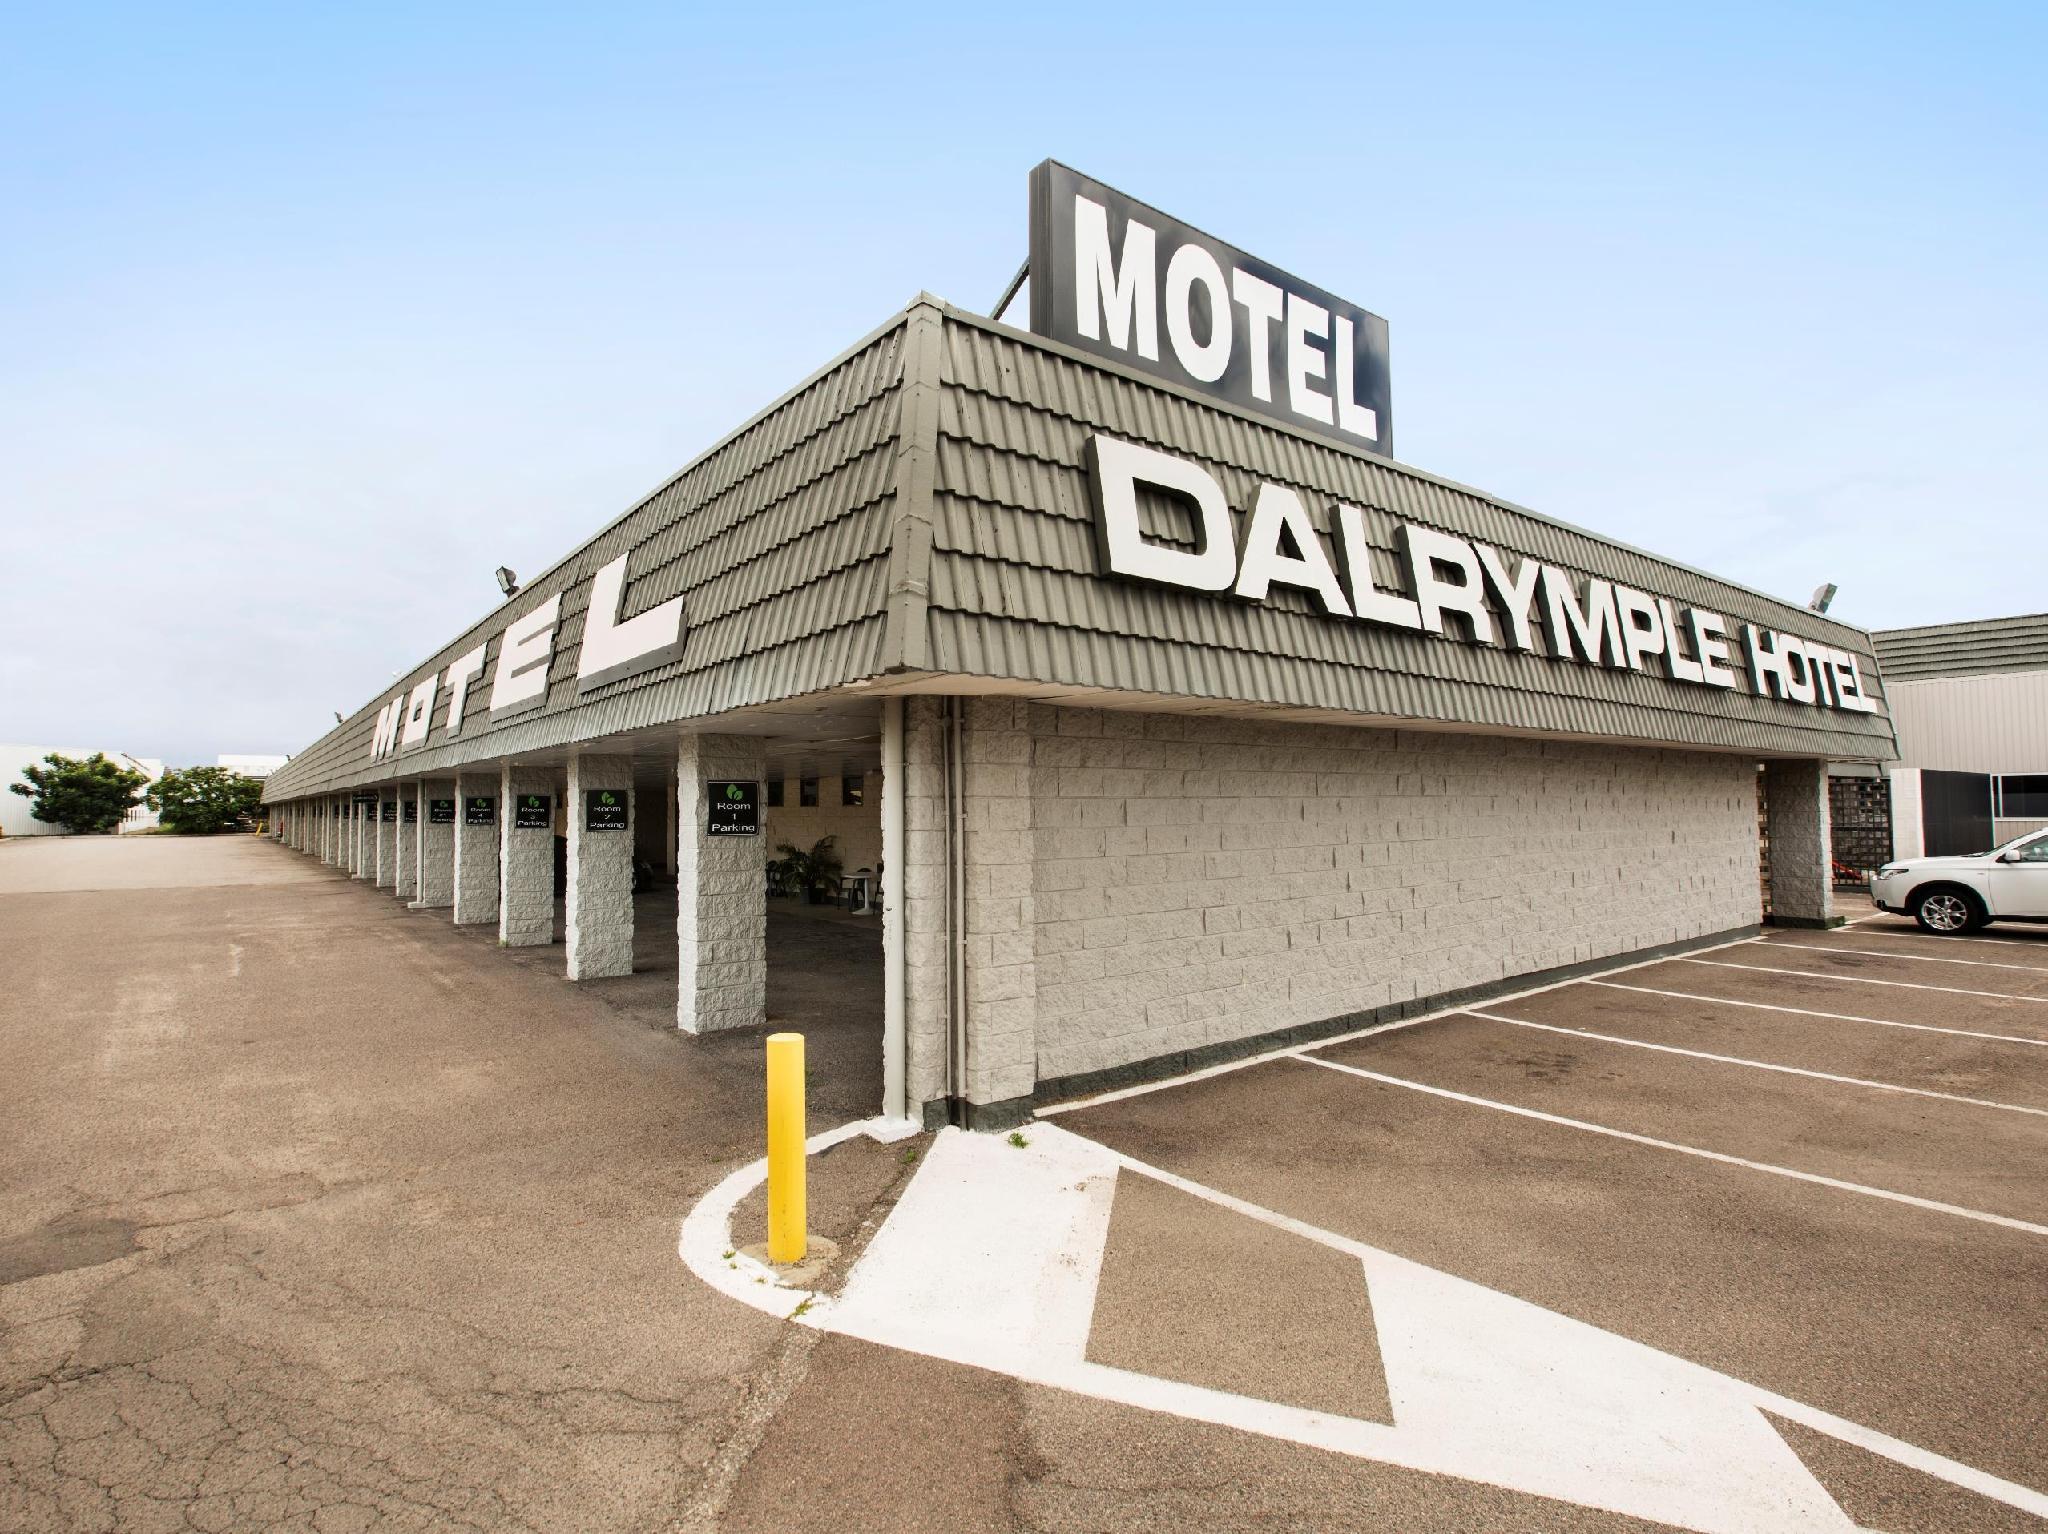 Dalrymple Hotel